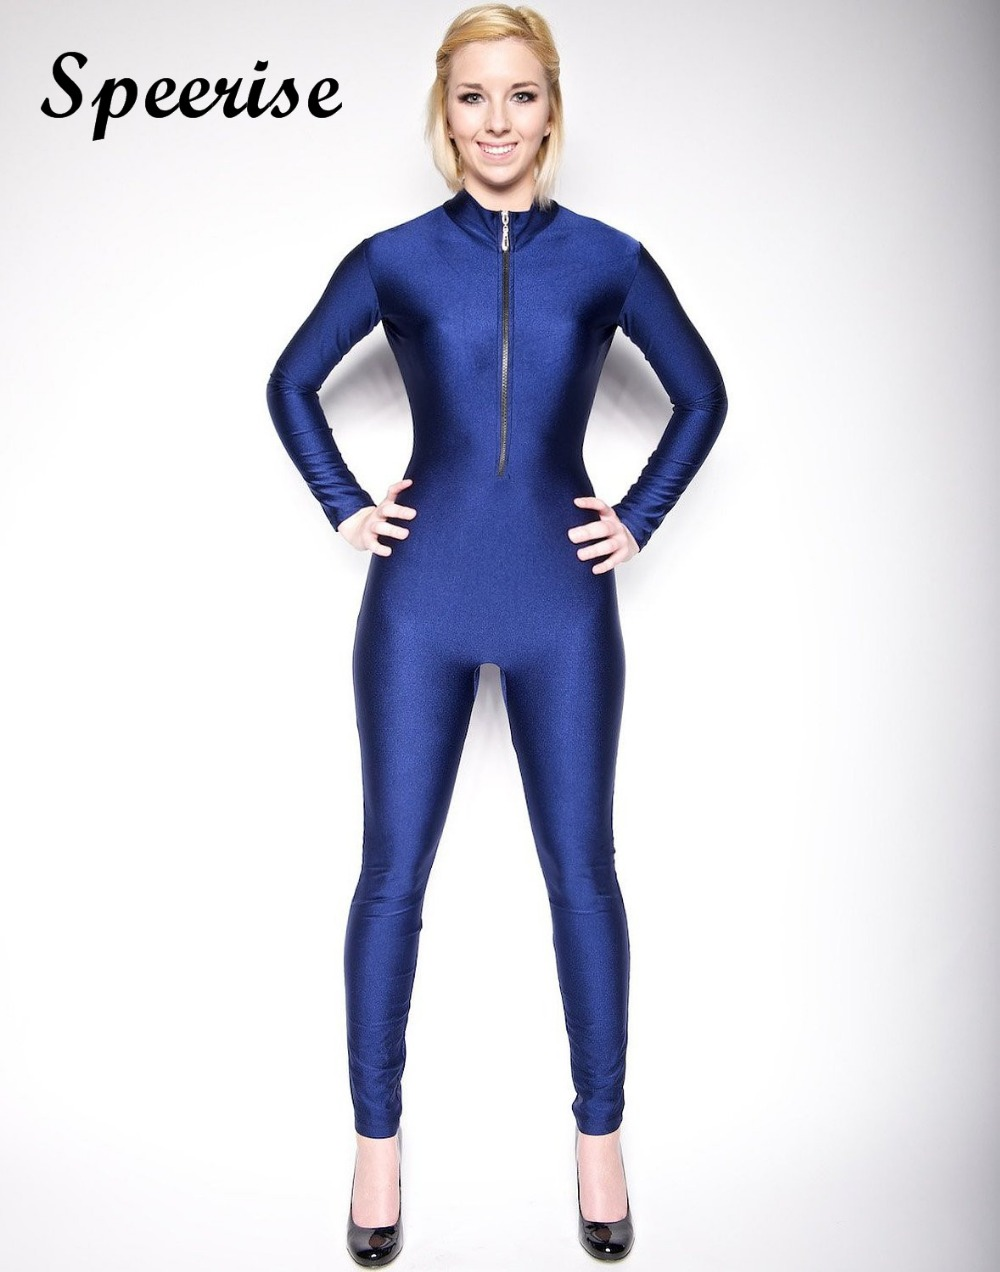 Speerise Adult  Spandex Long Sleeve Dancewear Women Turtleneck Unitard Bodysuit Full Length Front Zipper Suits